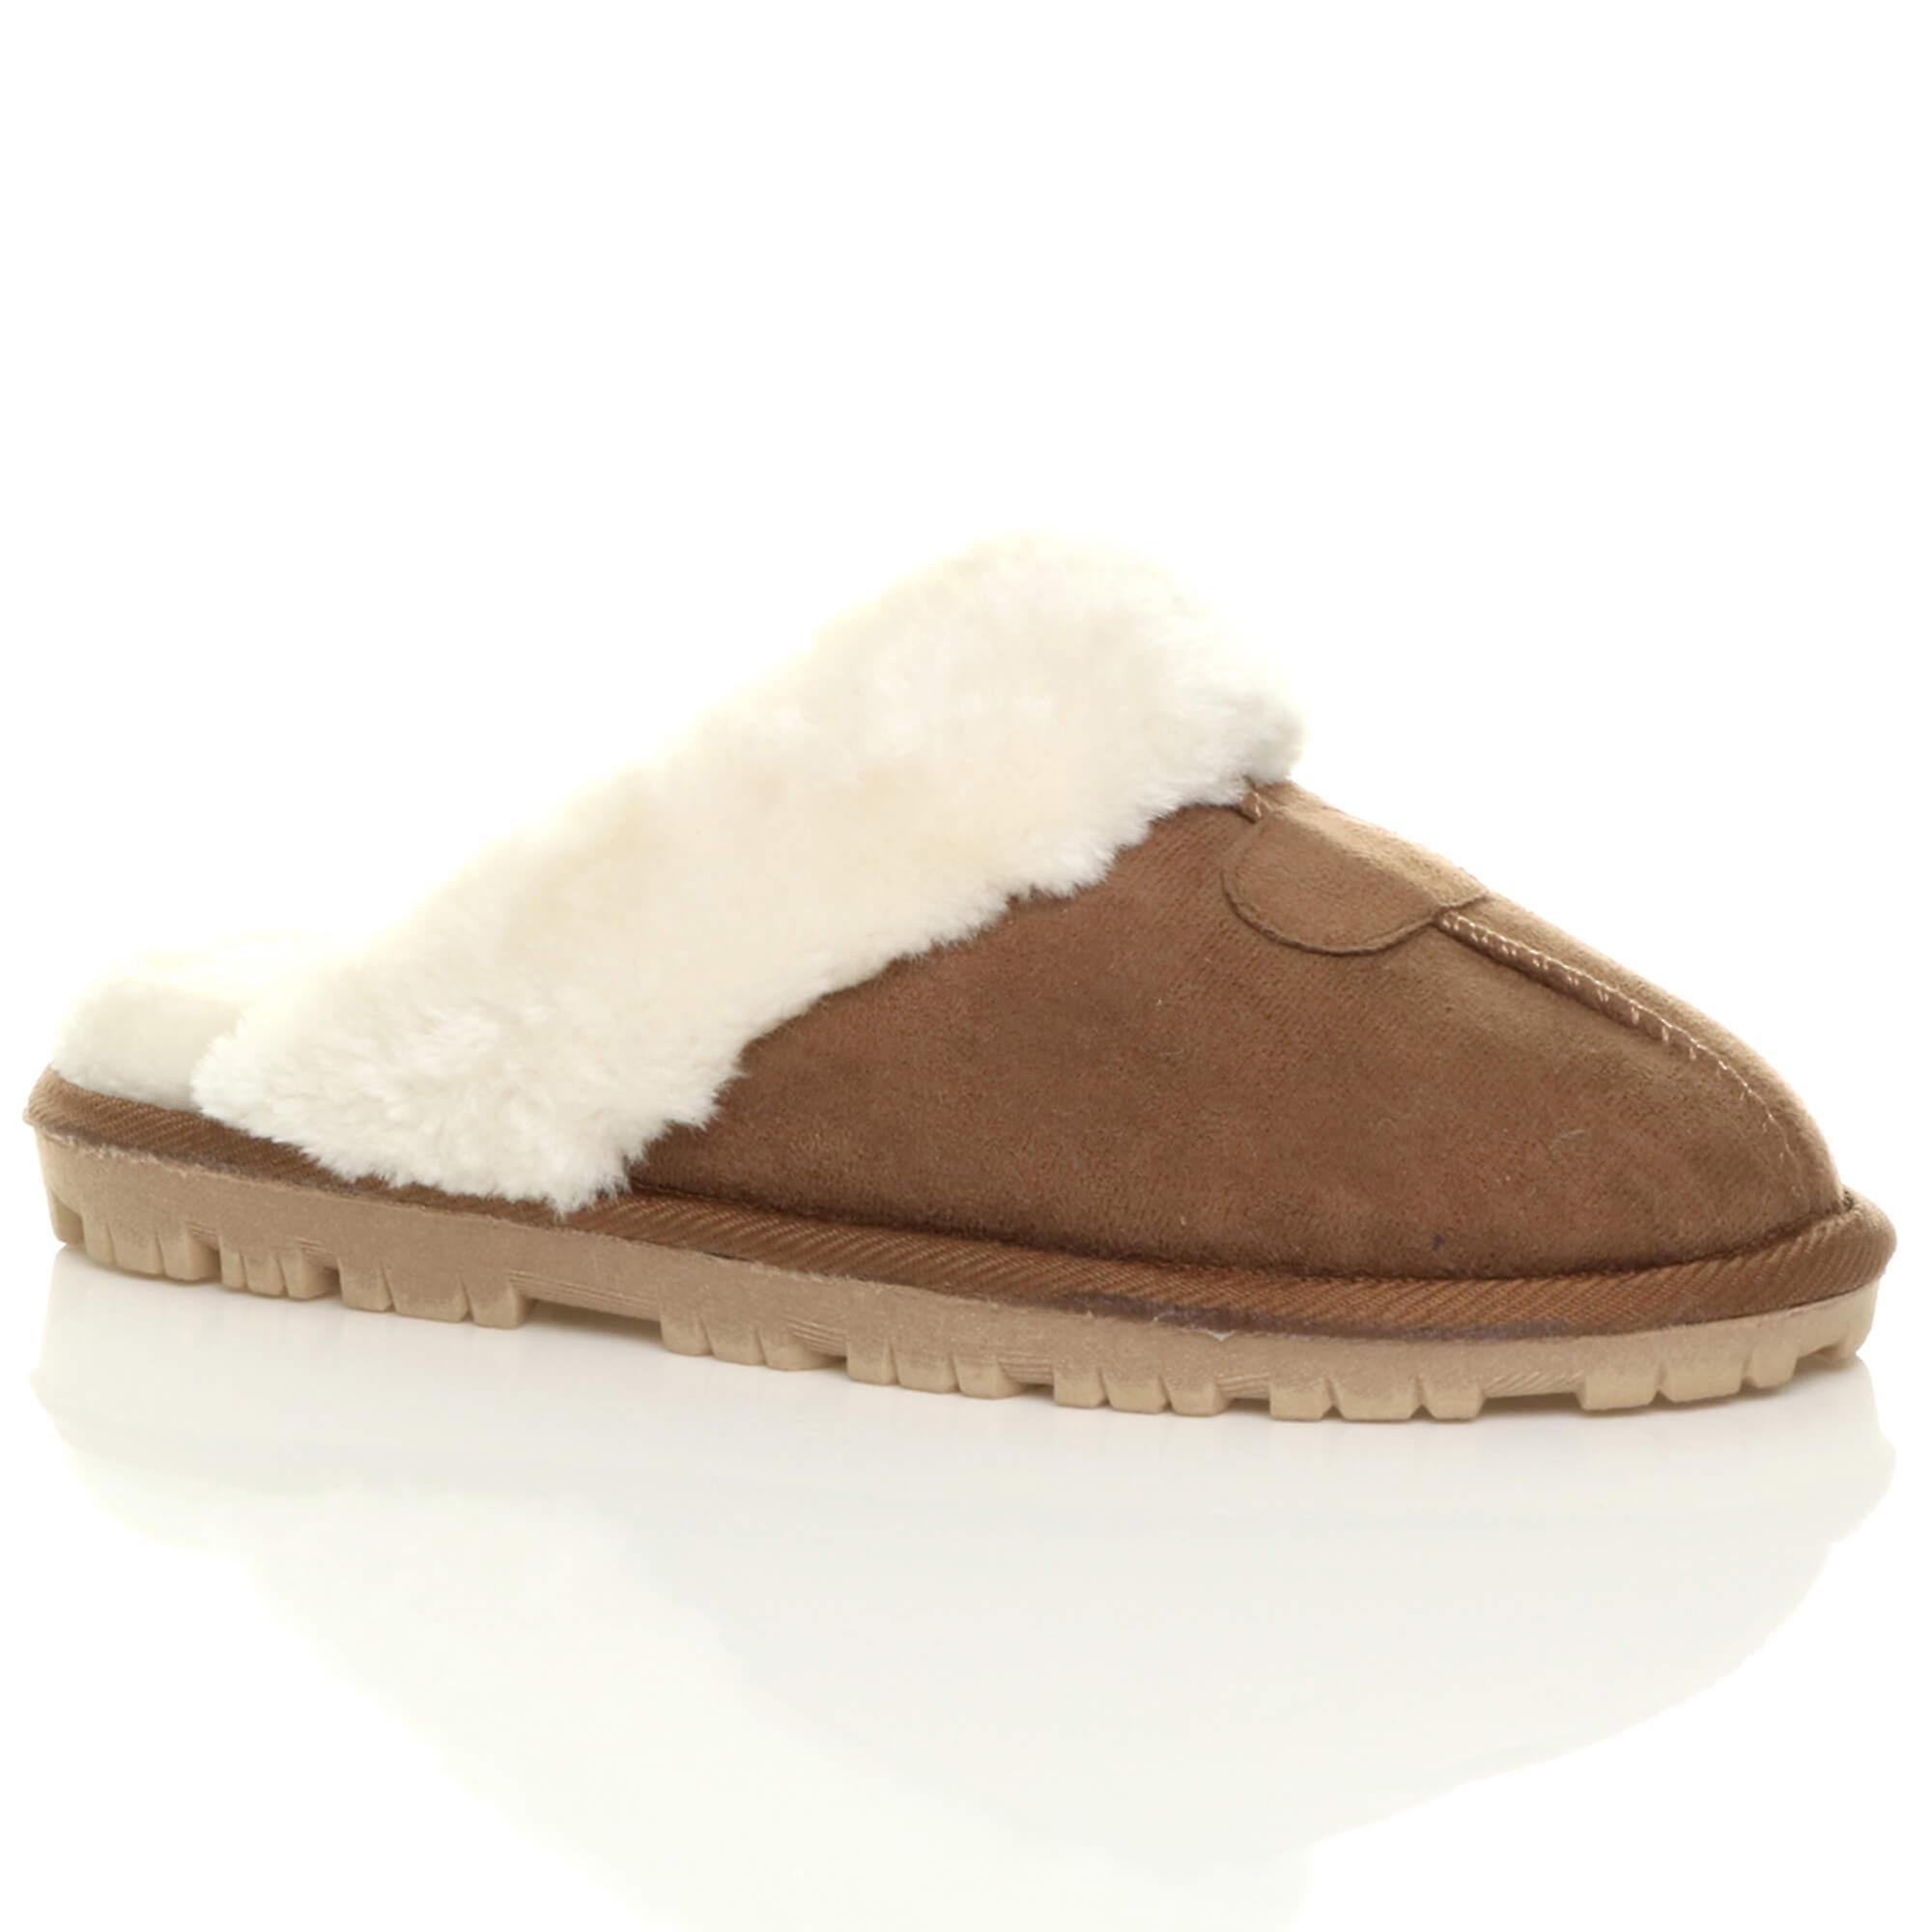 flat slip on mules womens lined luxury sheepskin shoes fur Ajvani winter faux slippers 04qwp8x